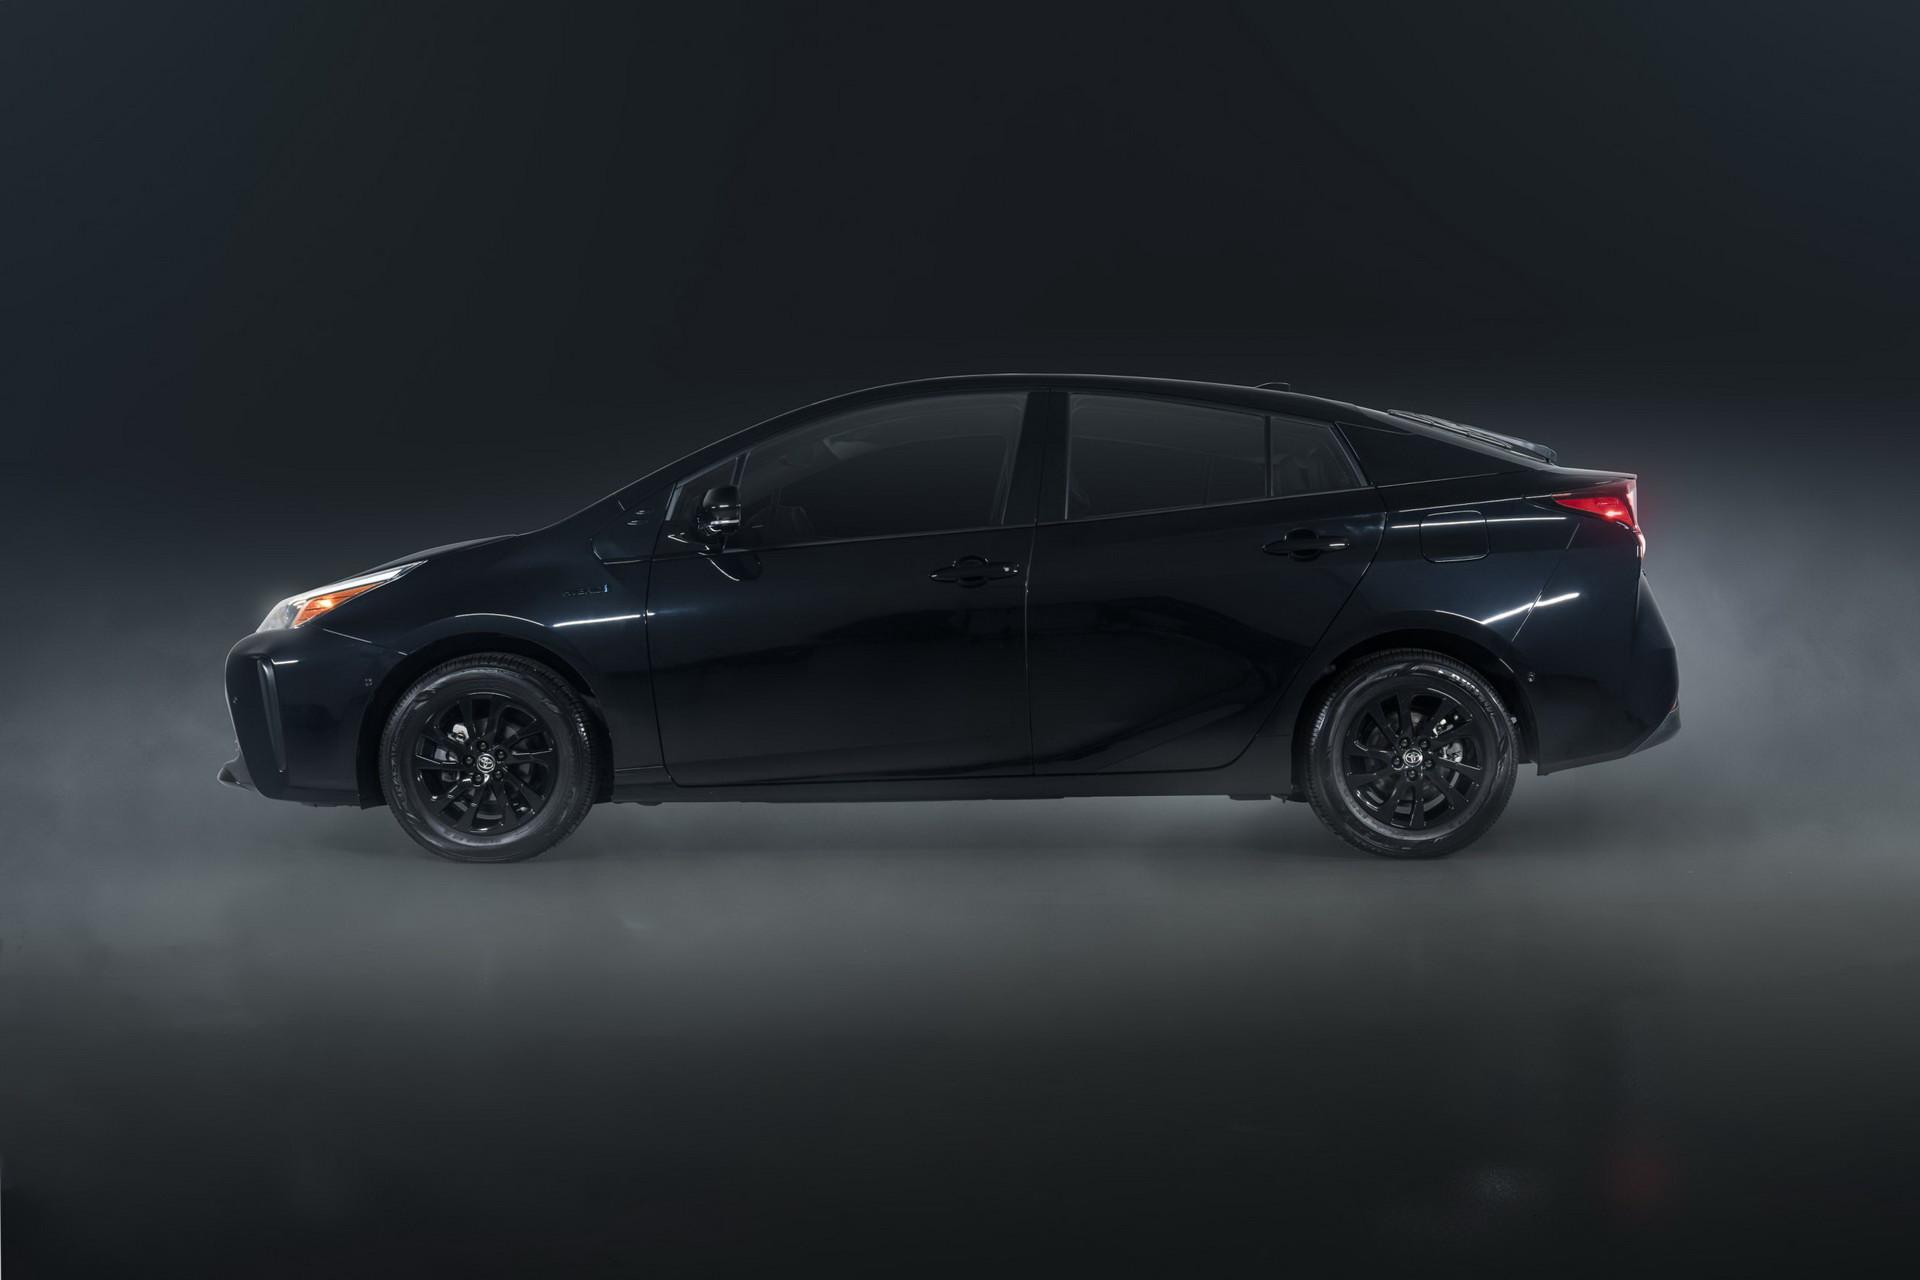 Toyota-Prius-Nightshade-Edition-8